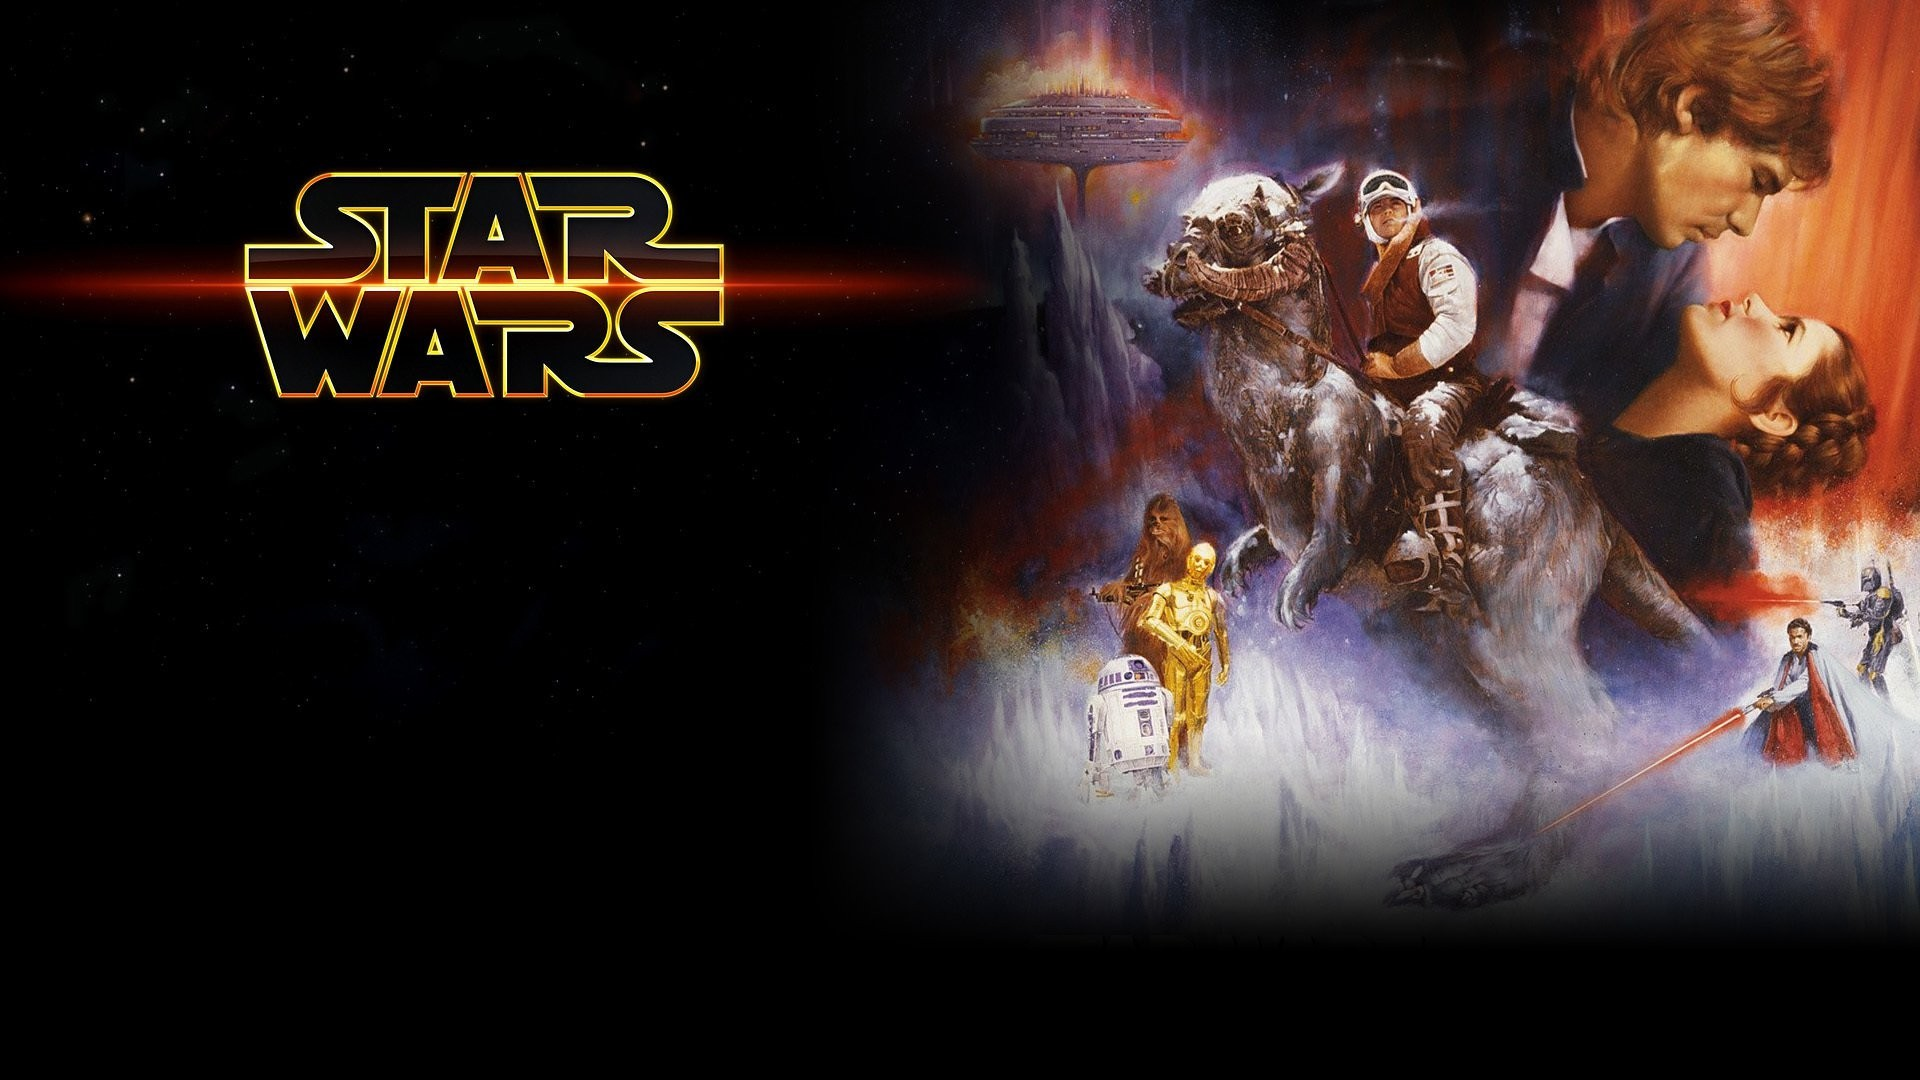 Star New 1920 Order Hd Wars 1080 X Wallpapers